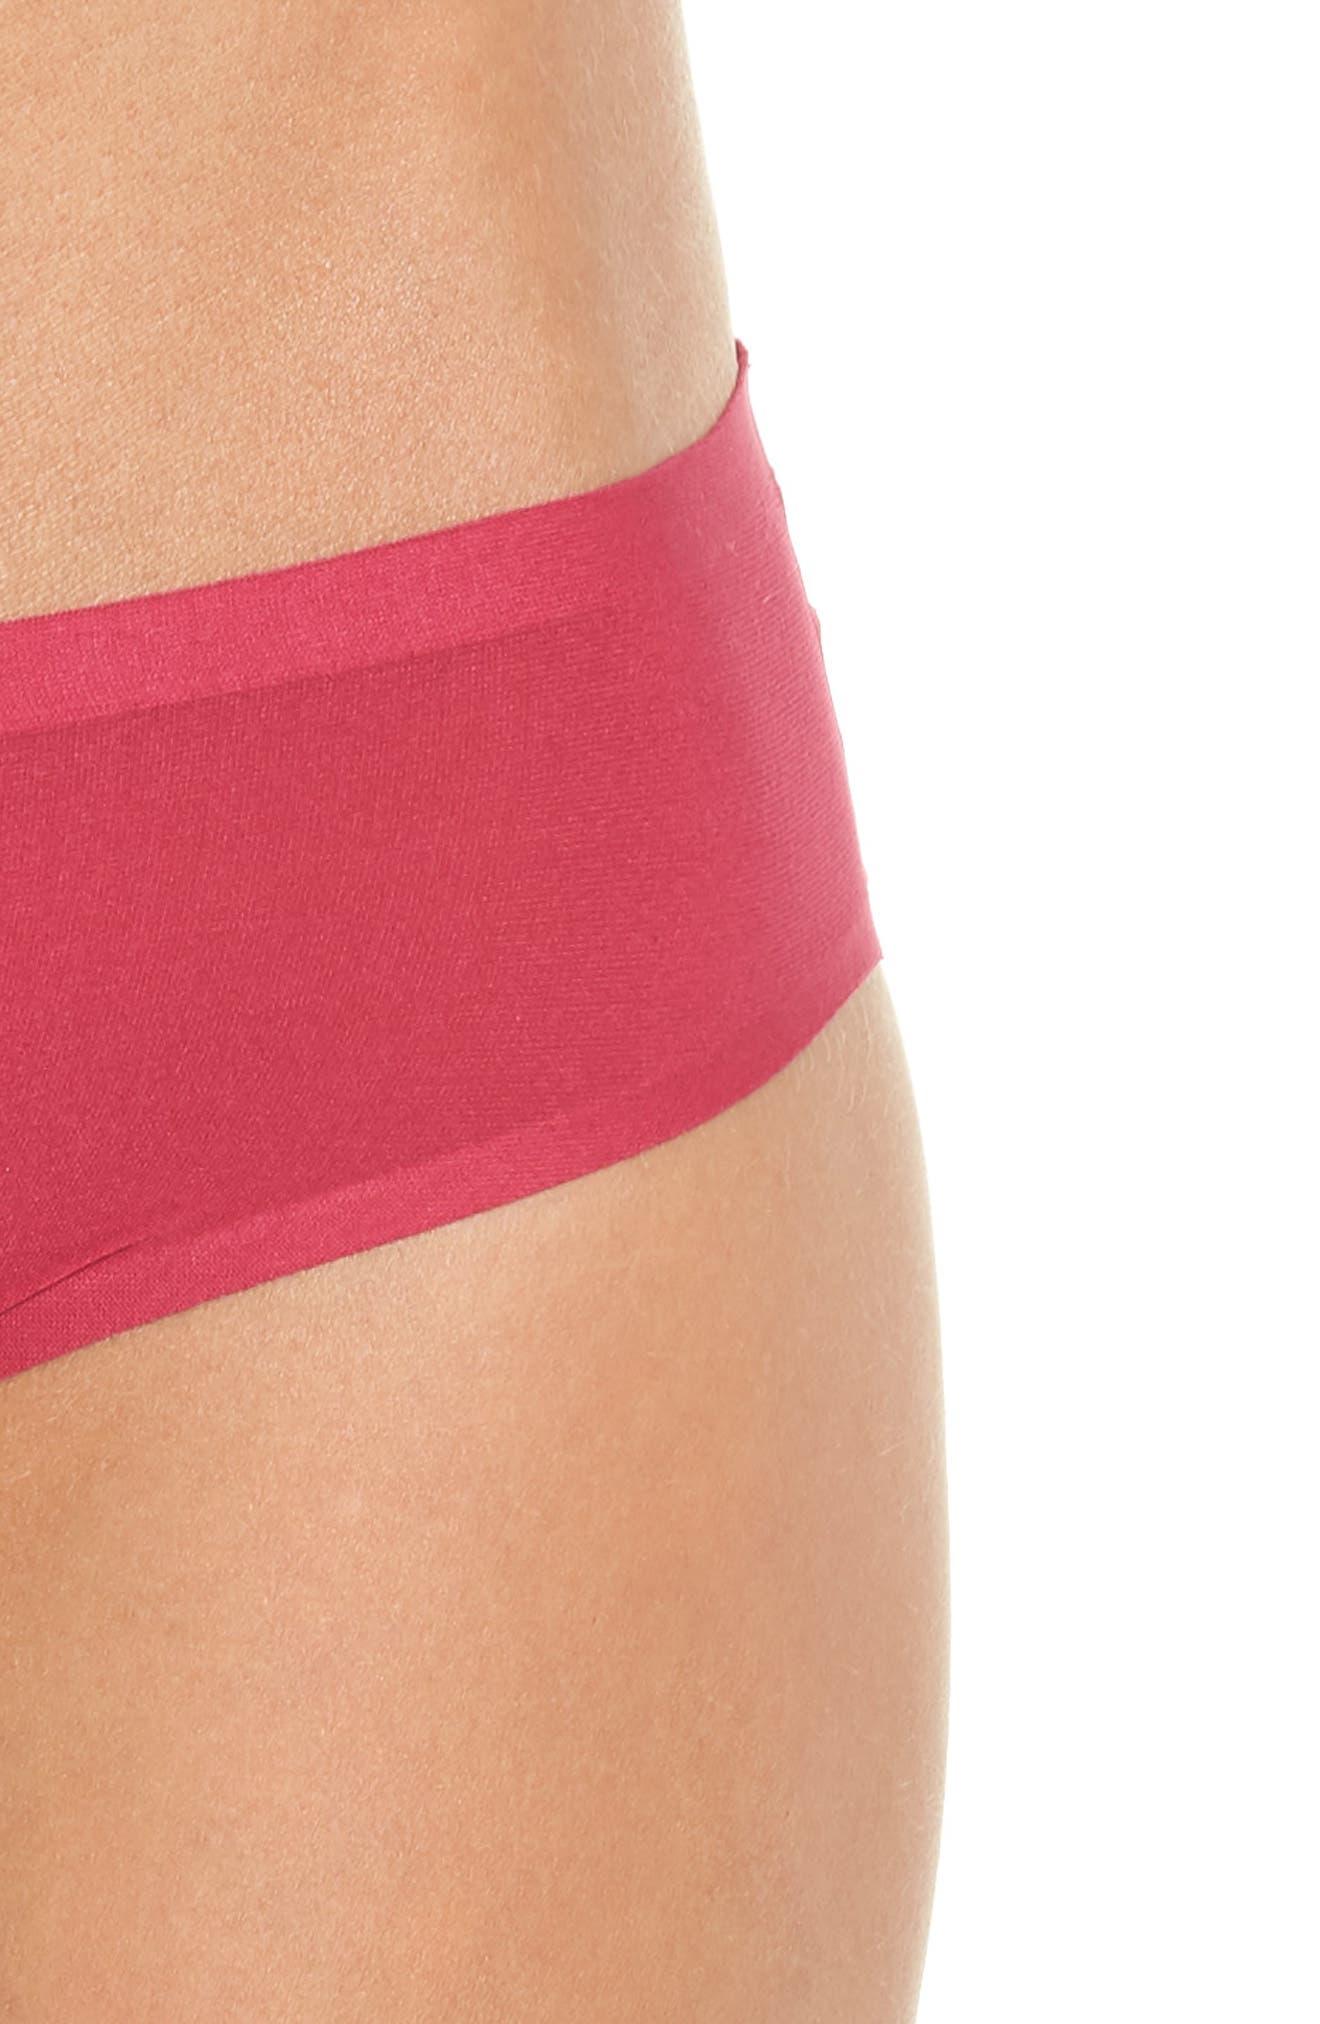 Soft Stretch Seamless Bikini,                             Alternate thumbnail 4, color,                             MAGENTA